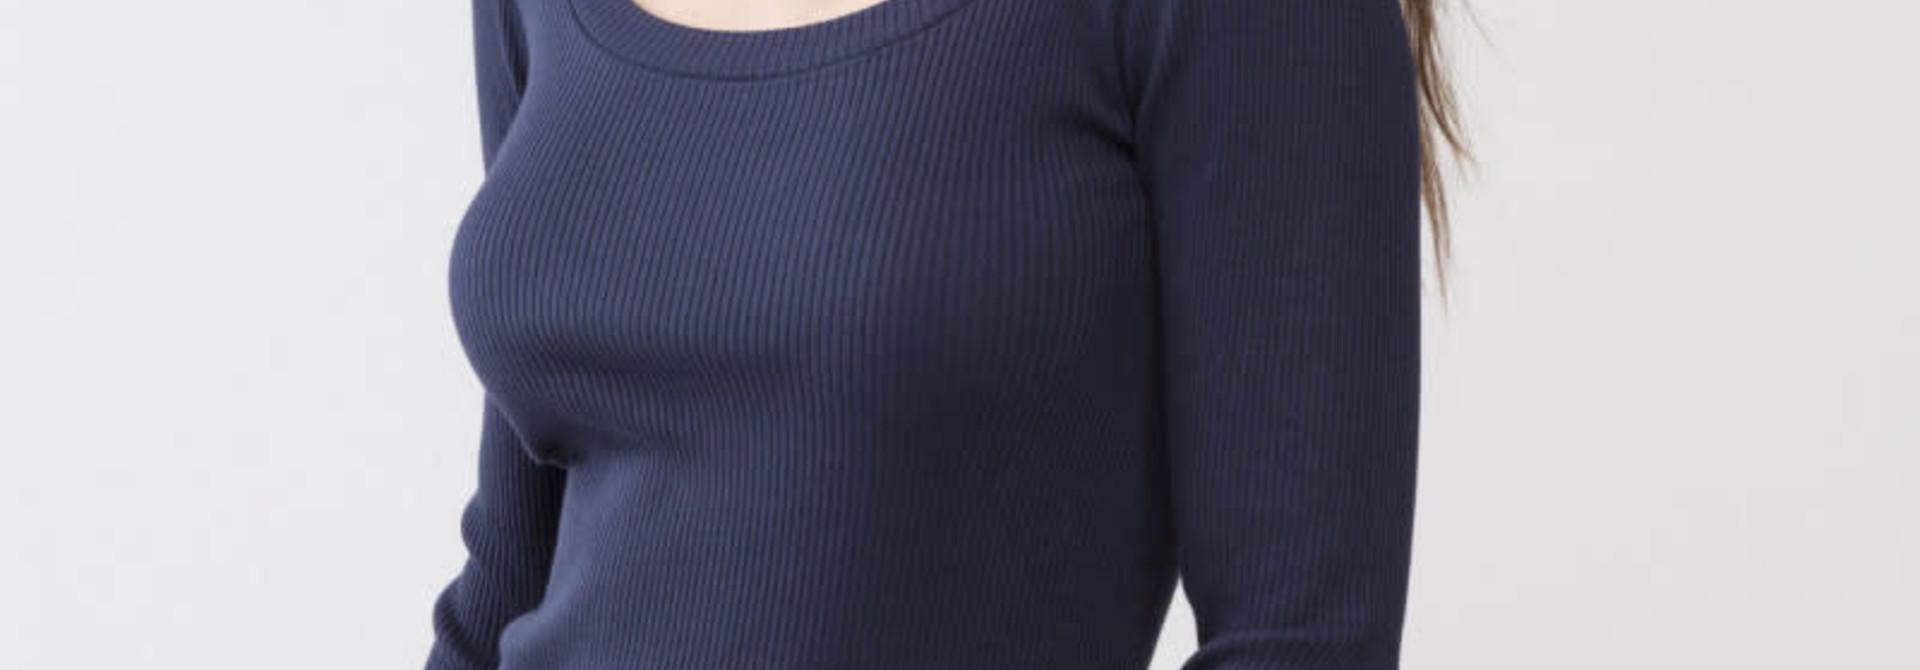 T-shirt lange mouw Cotton Rib 26516 - donkerblauw